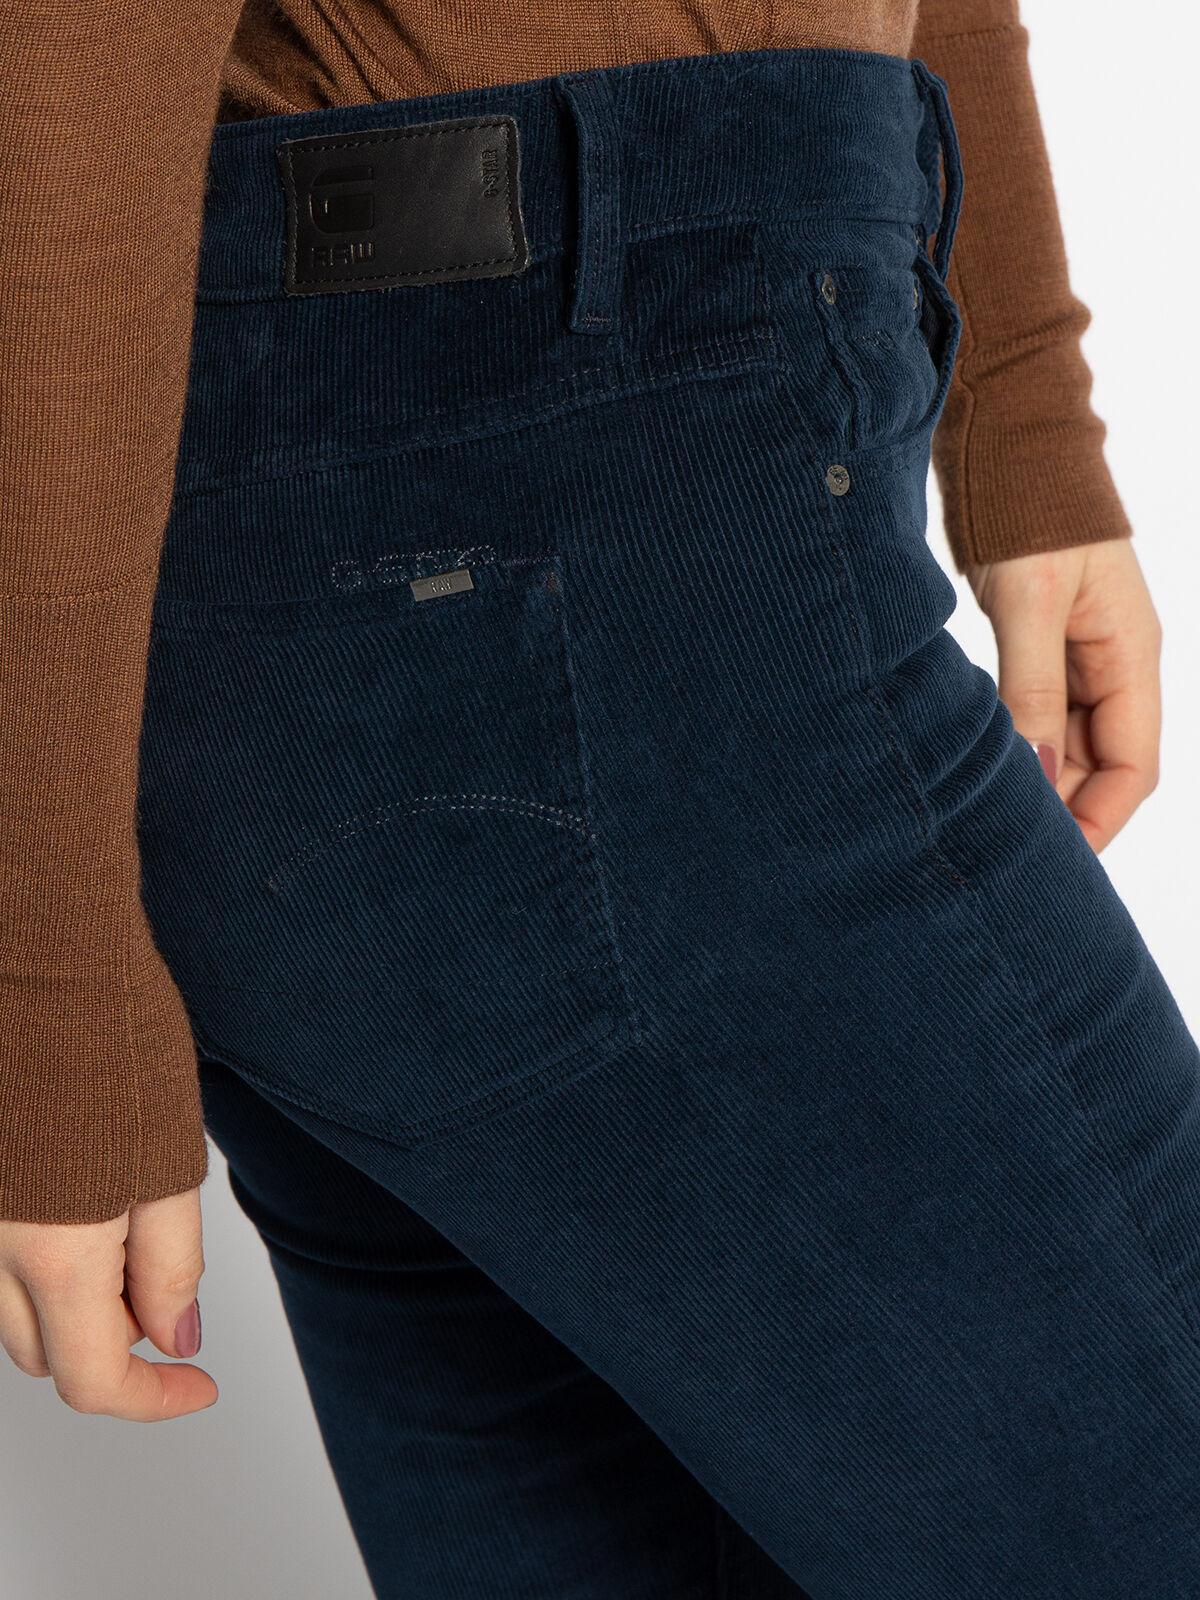 3301 Corduroy Trousers